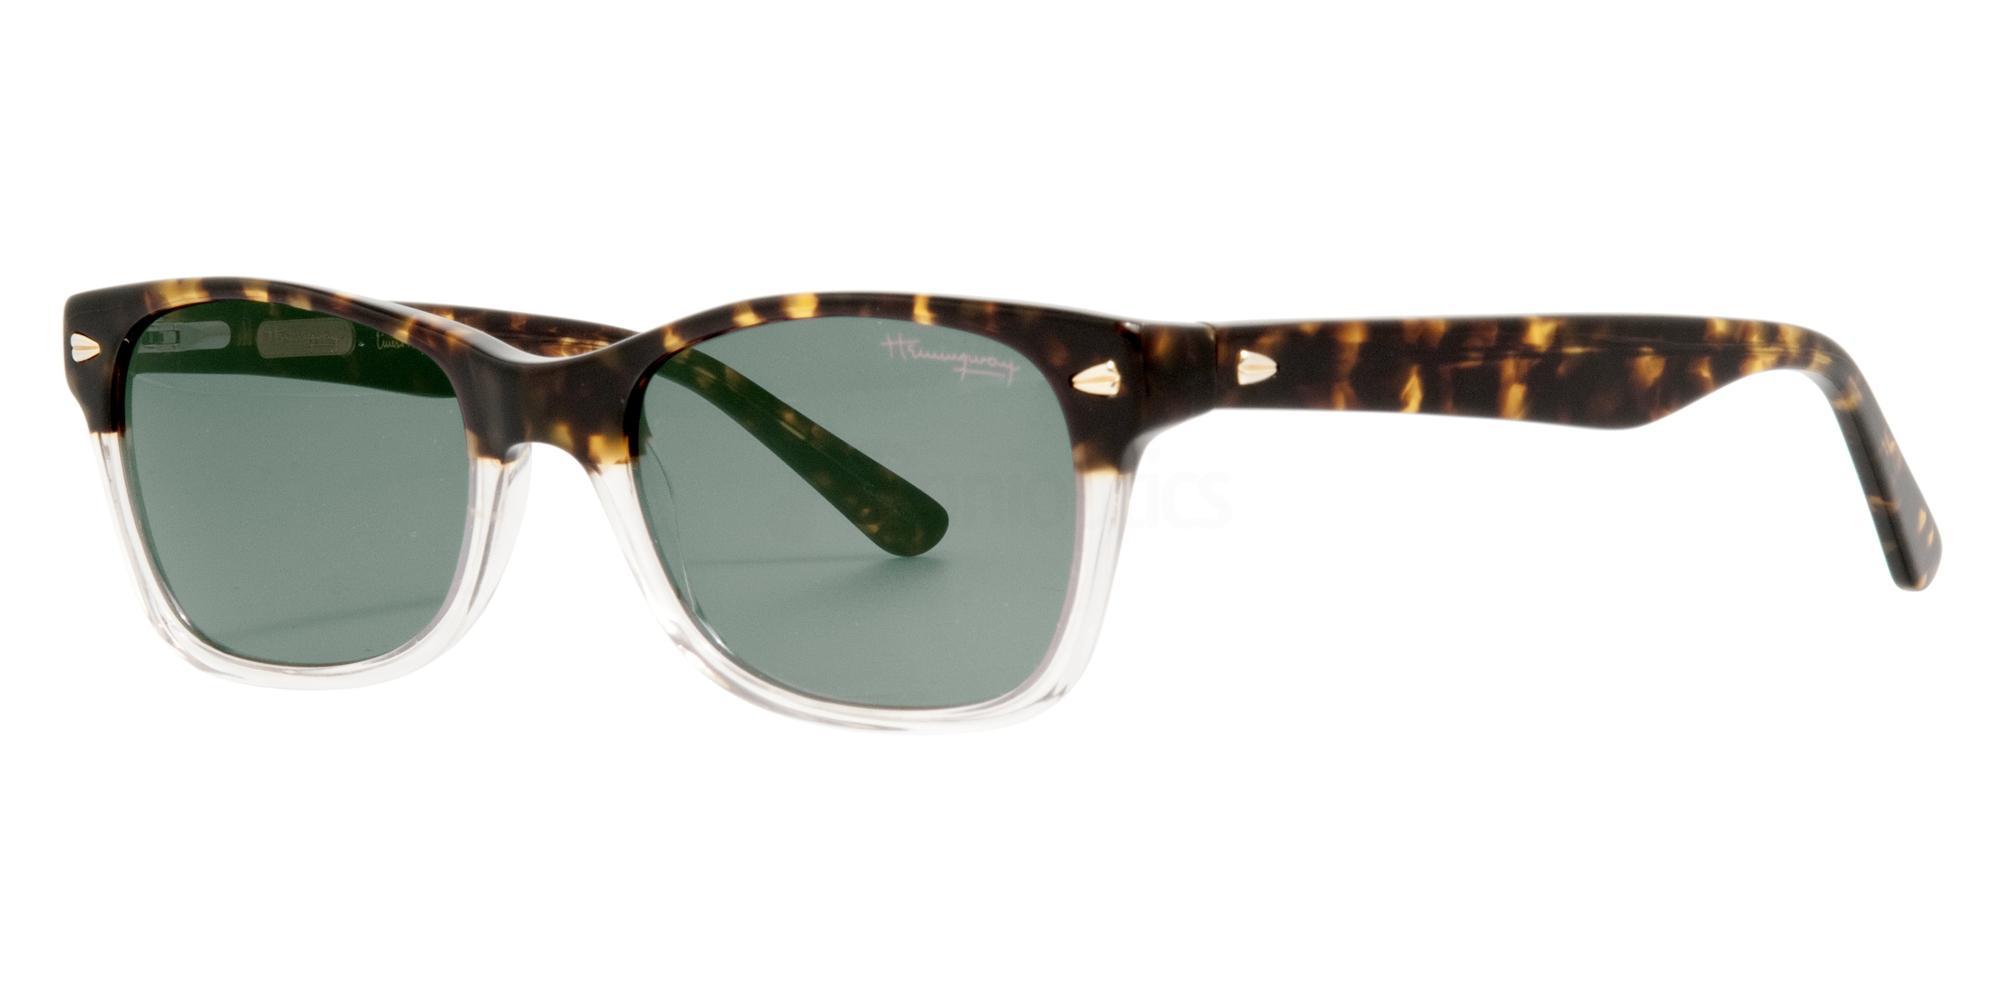 01 EH4706 Sunglasses, Ernest Hemmingway